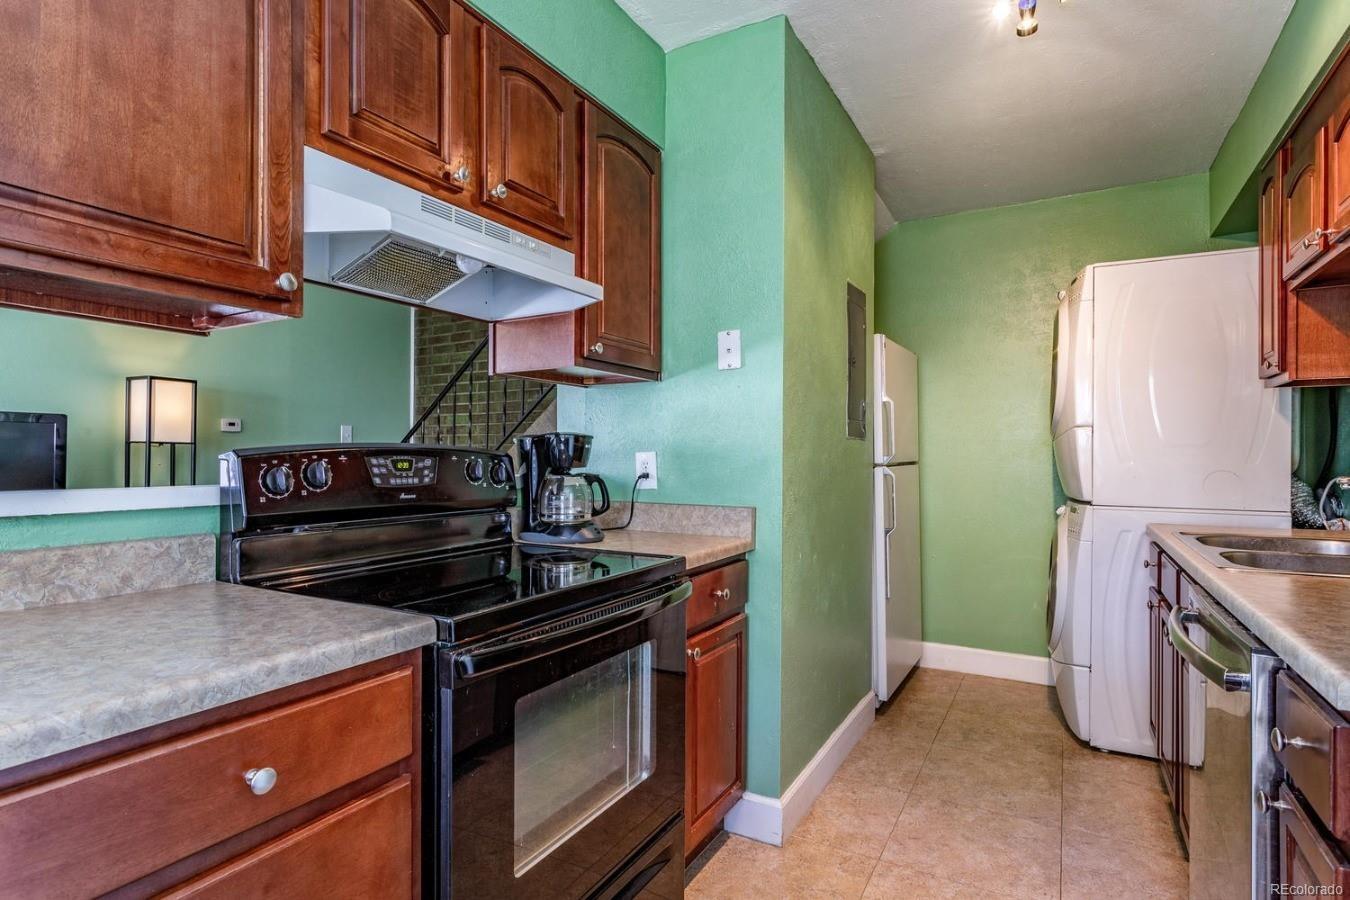 MLS# 8240620 - 9 - 7309 W Hampden Avenue #6203, Lakewood, CO 80227